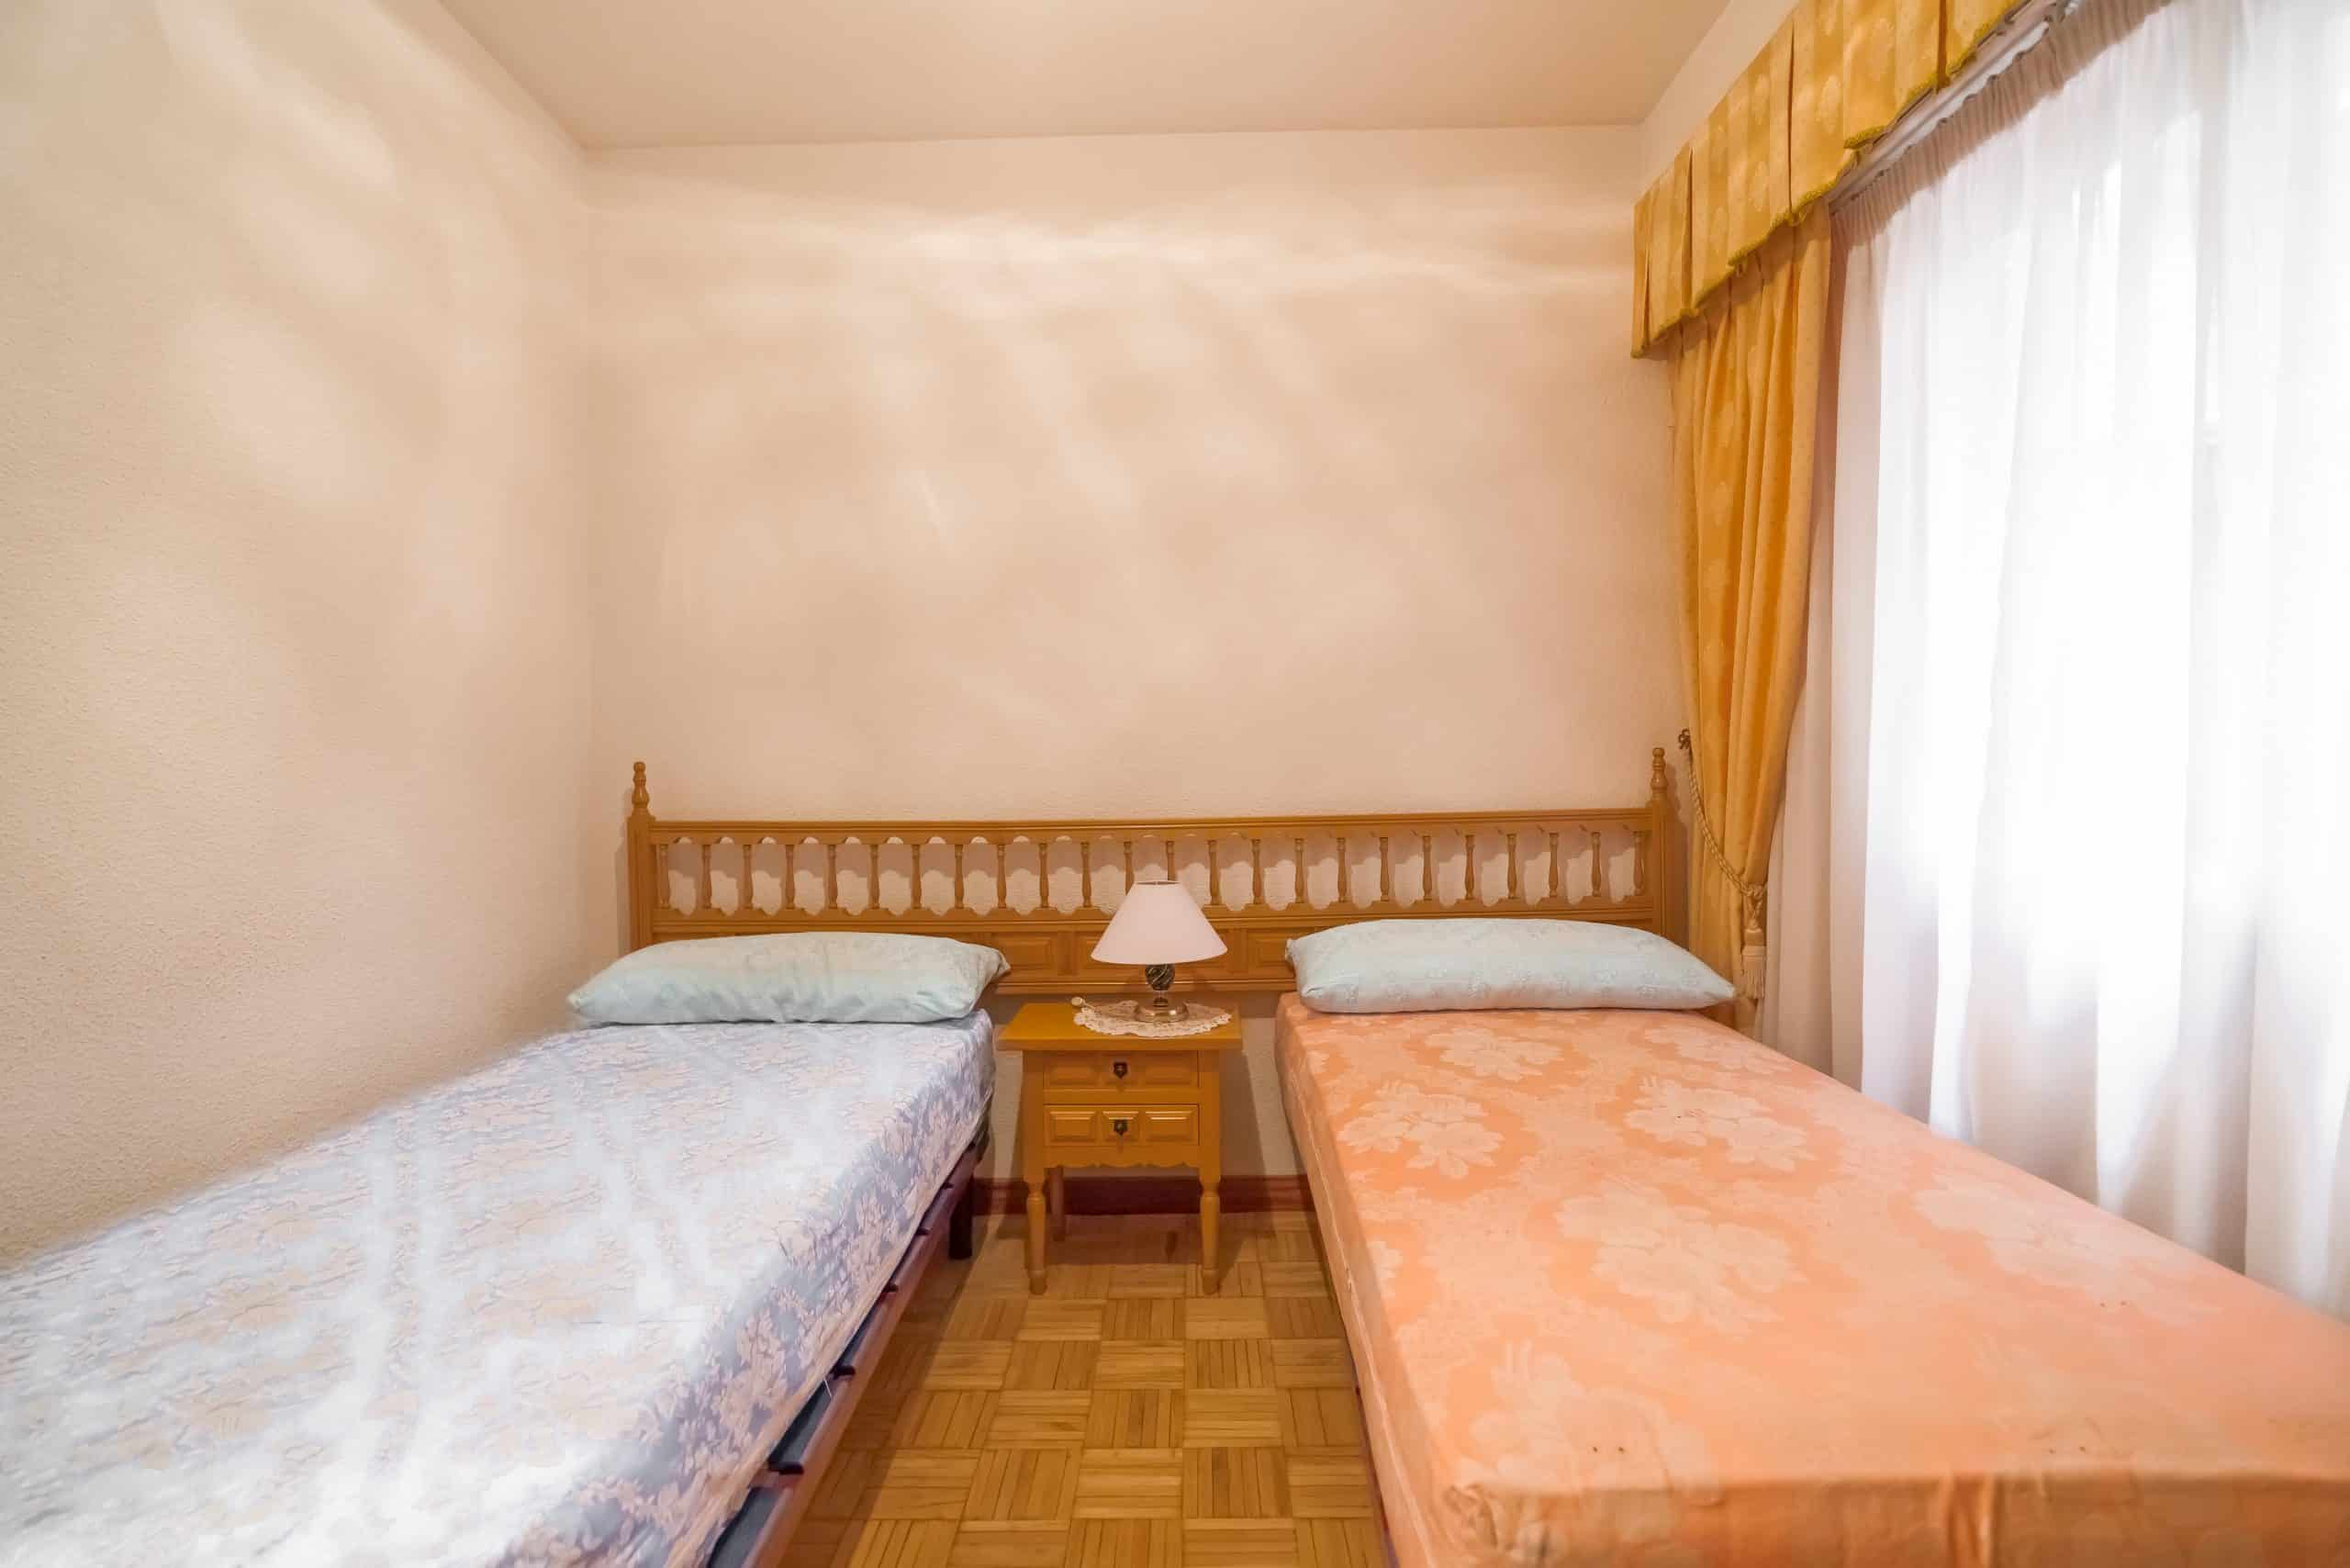 Agencia Inmobiliaria de Madrid-FUTUROCASA-Zona ARGANZUELA-EMBAJADORES-LEGAZPI -calle tomas borras- Dormitorio (2)